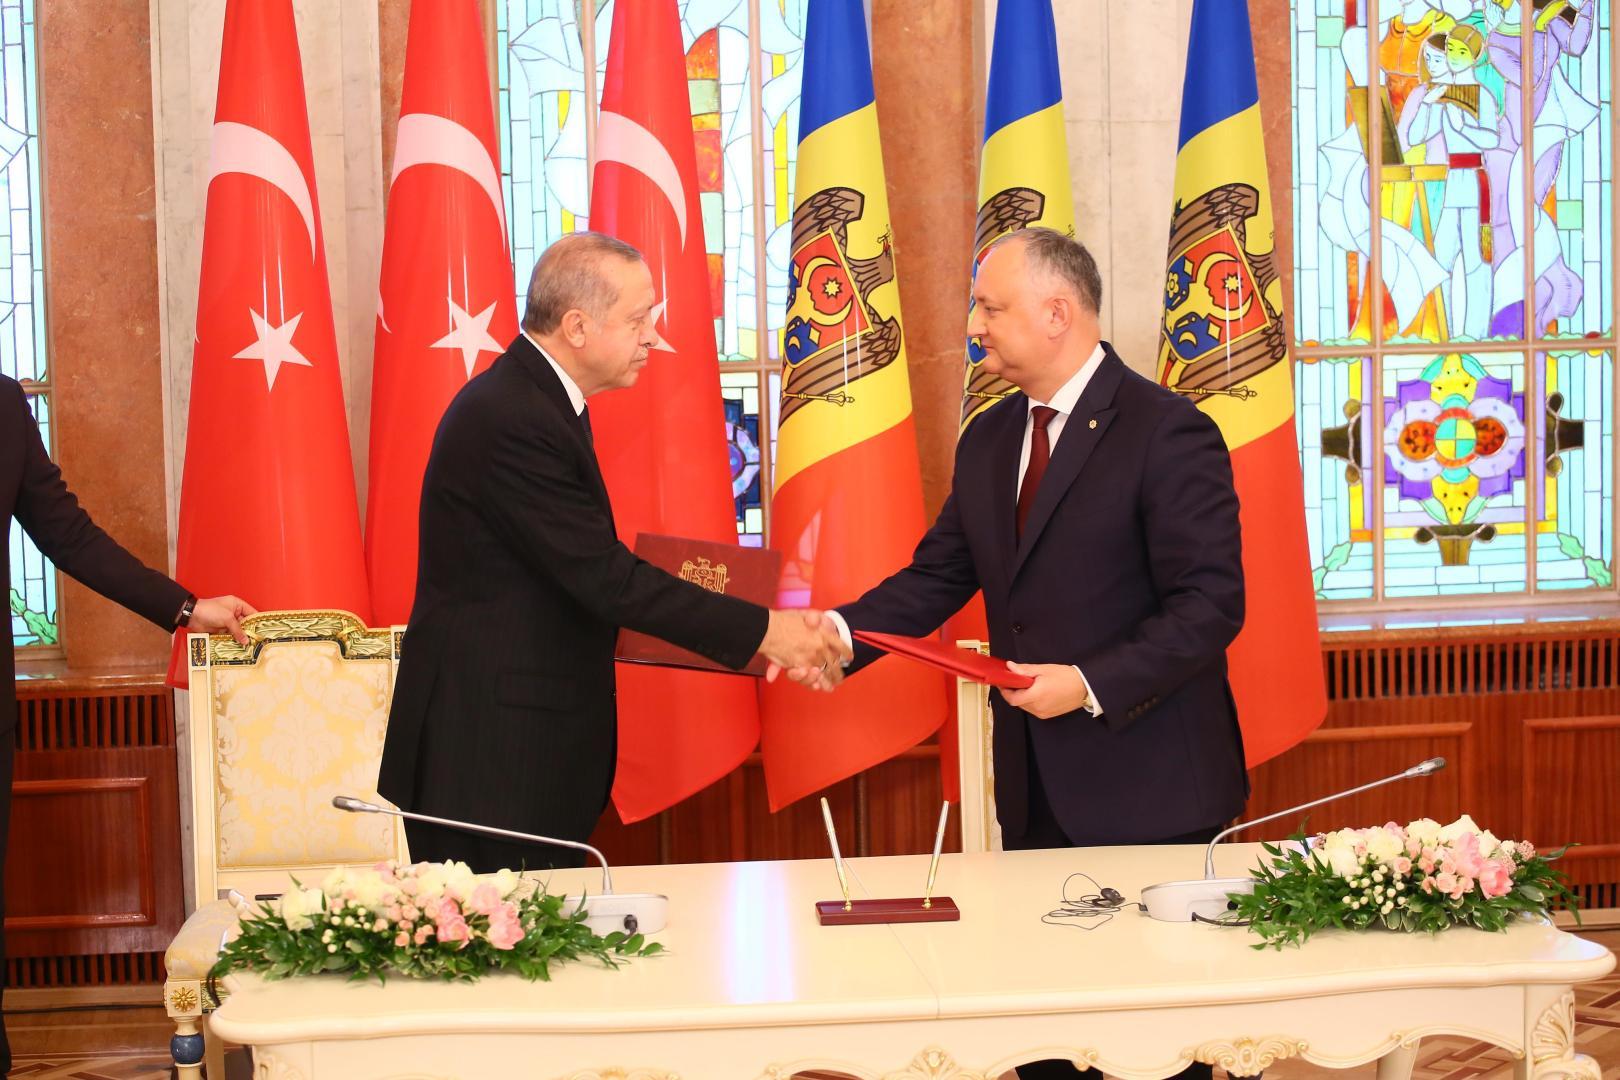 Presedintele de la Chisinau, Igor Dodon, mizeaza pe sprijinul omologului sau turc, Recep Tayyip Erdogan